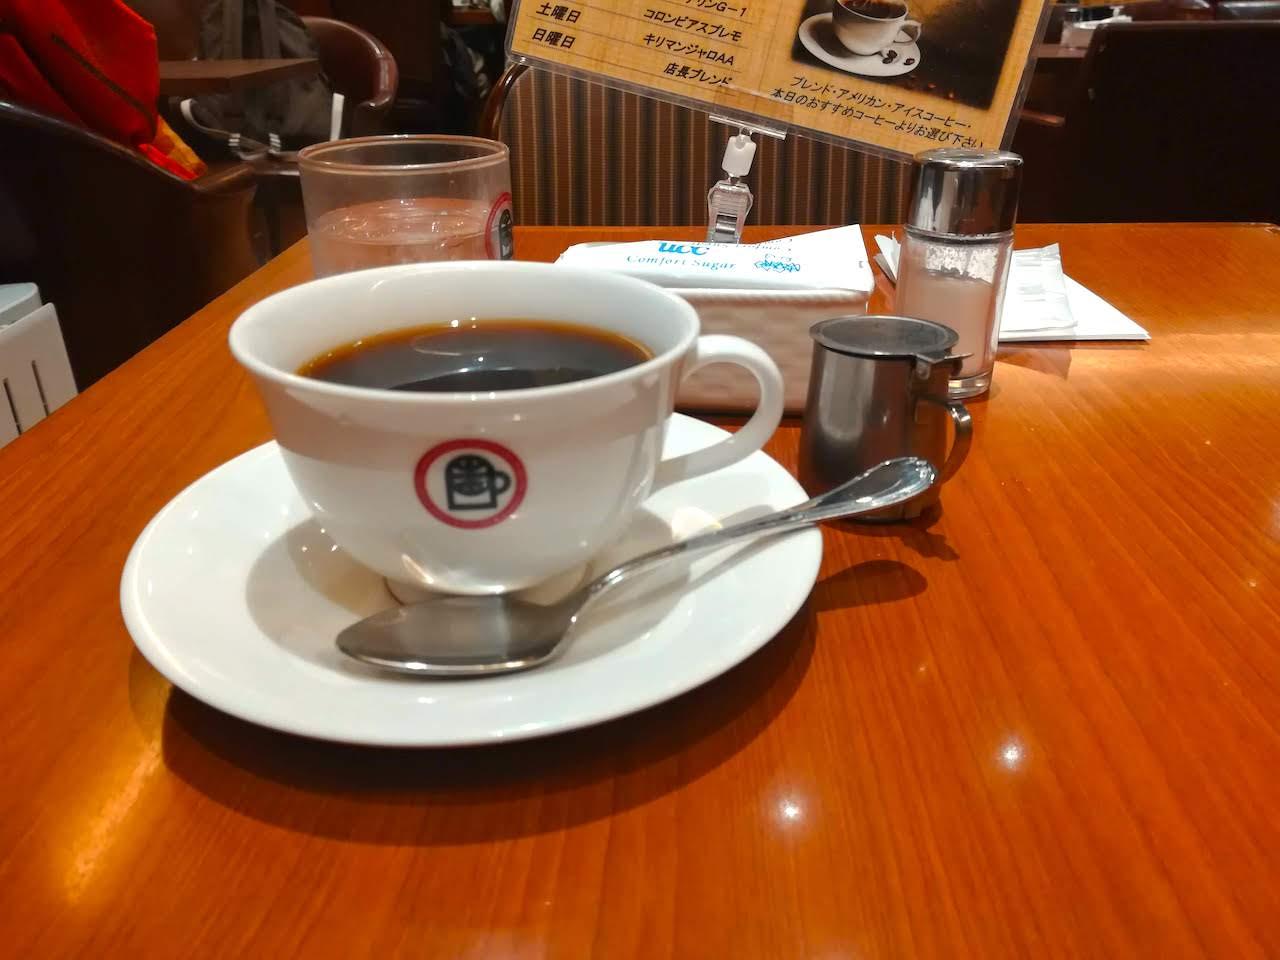 http://morning.tokyo-review.com/images/IMG_20190121_090521.jpg